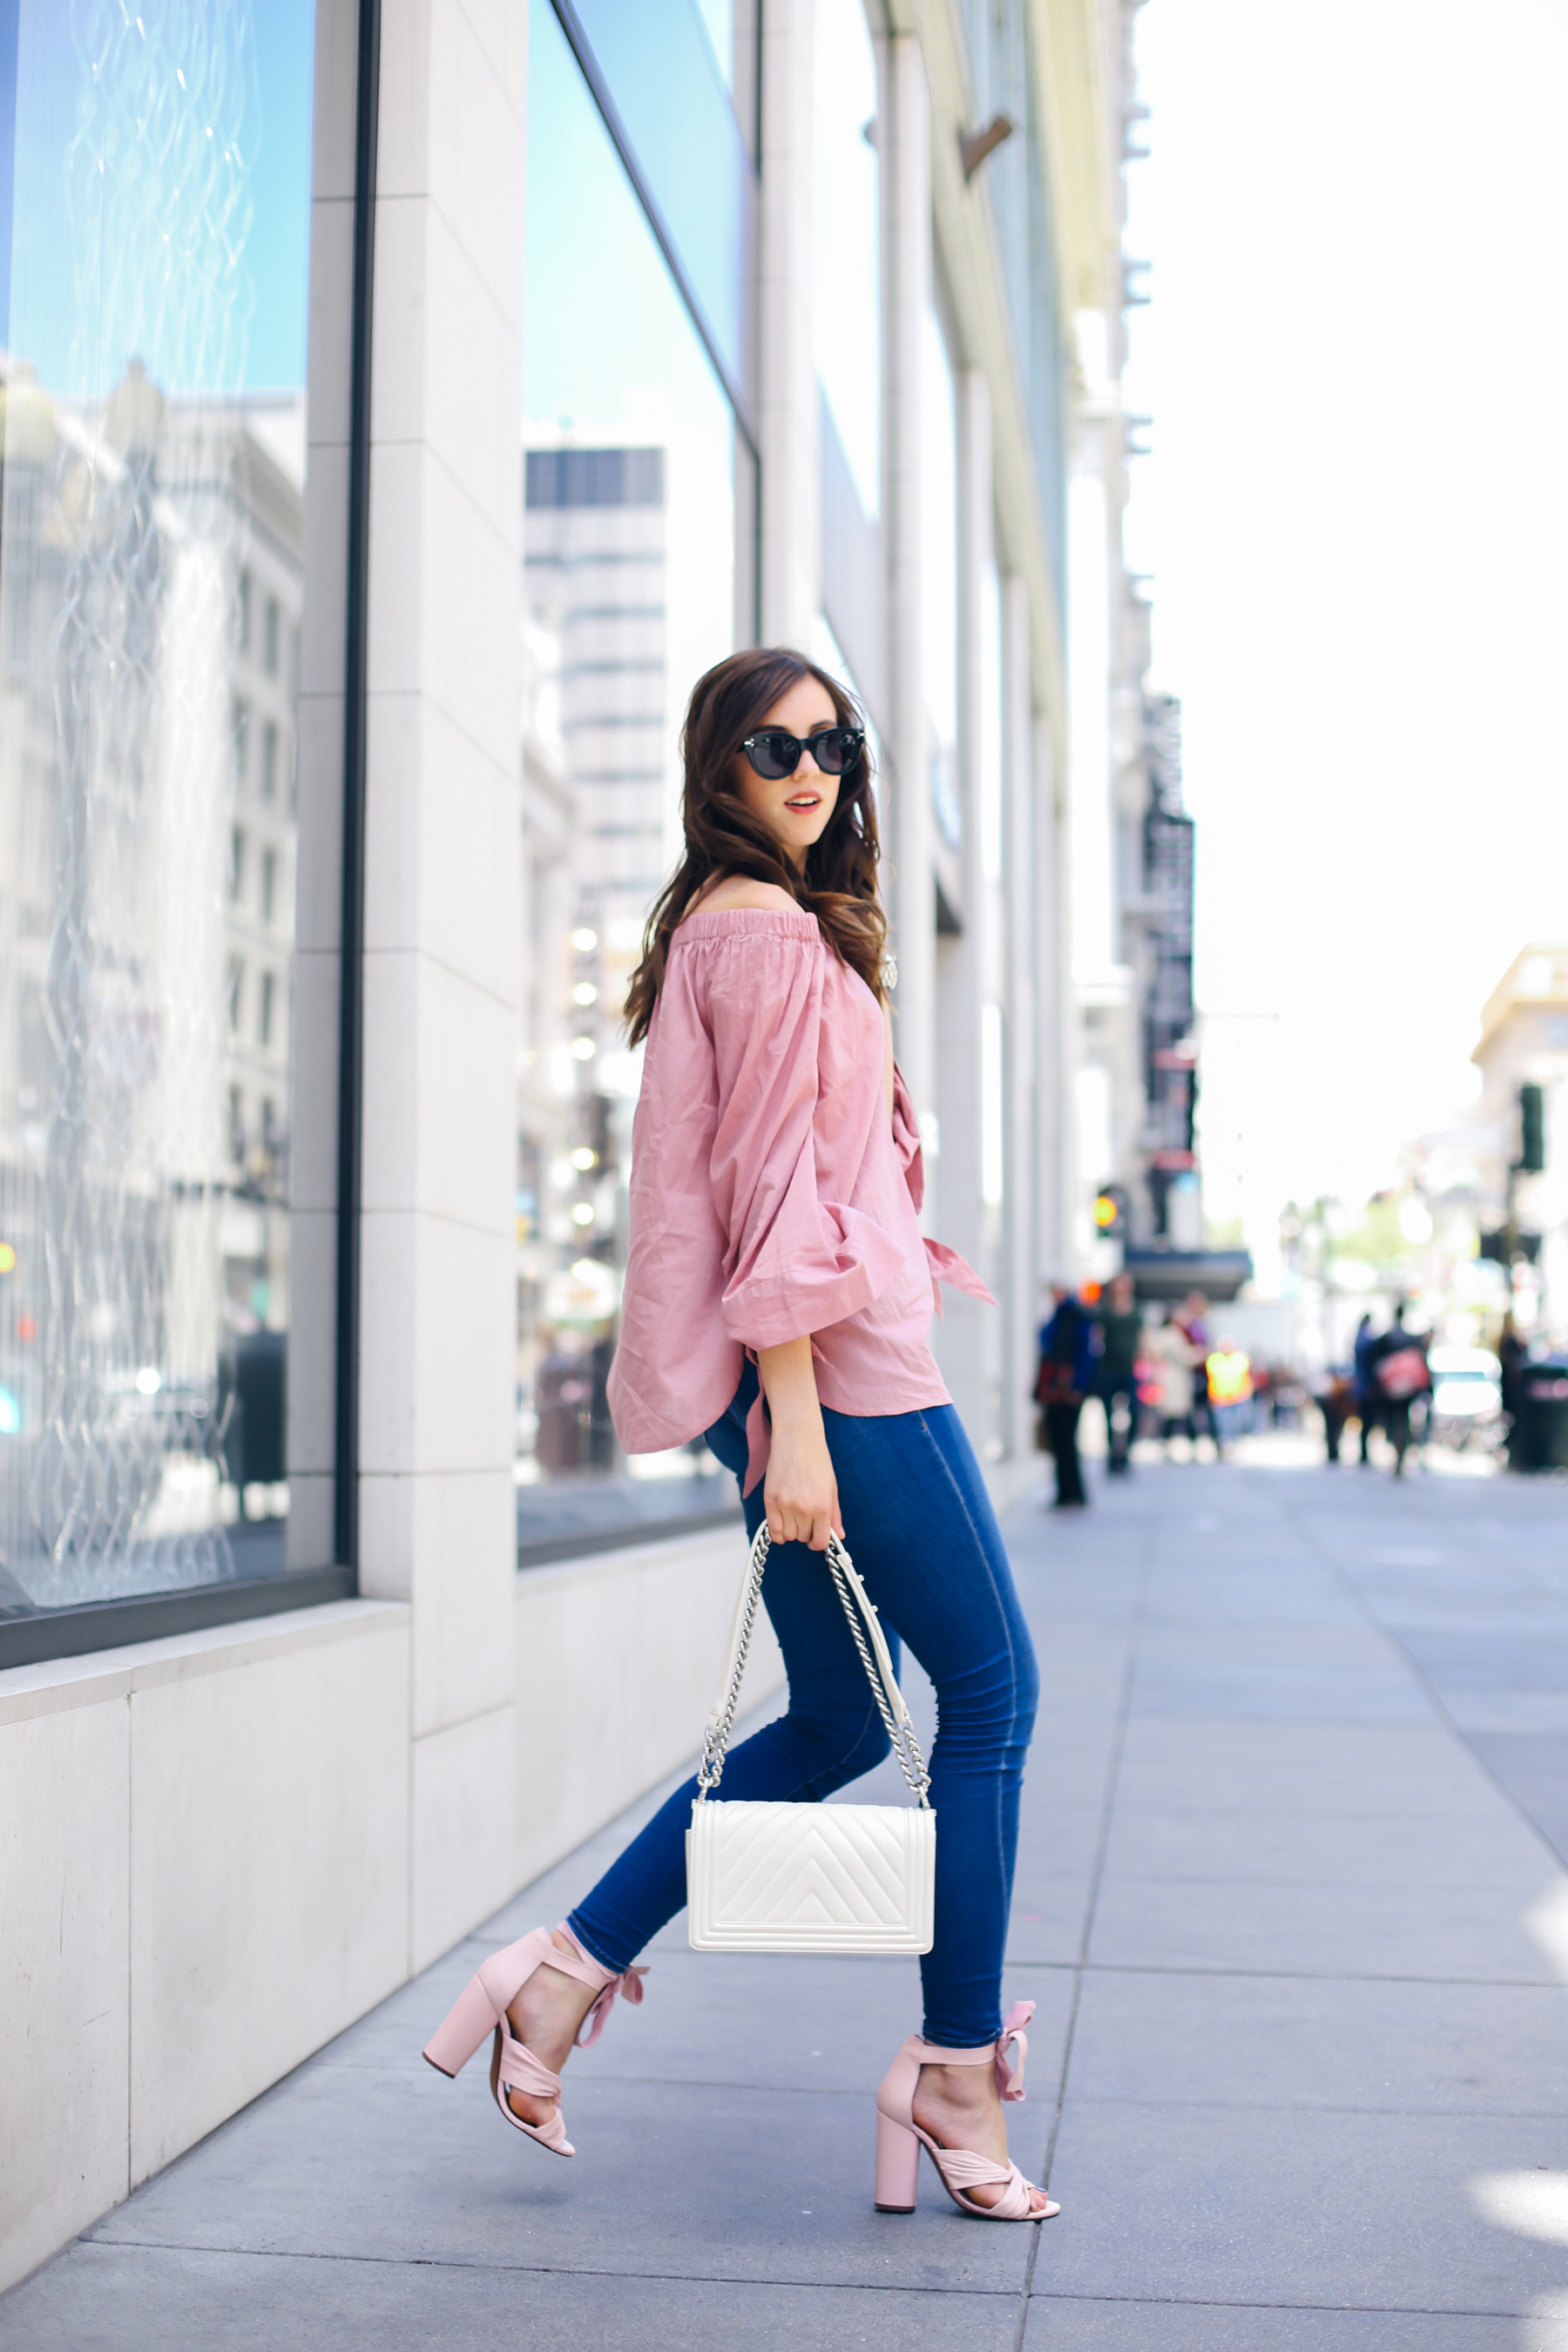 Barbora-Ondracova-FashioninmySoul-Fashion-Blogger-Photography-RyanbyRyanChua-7270